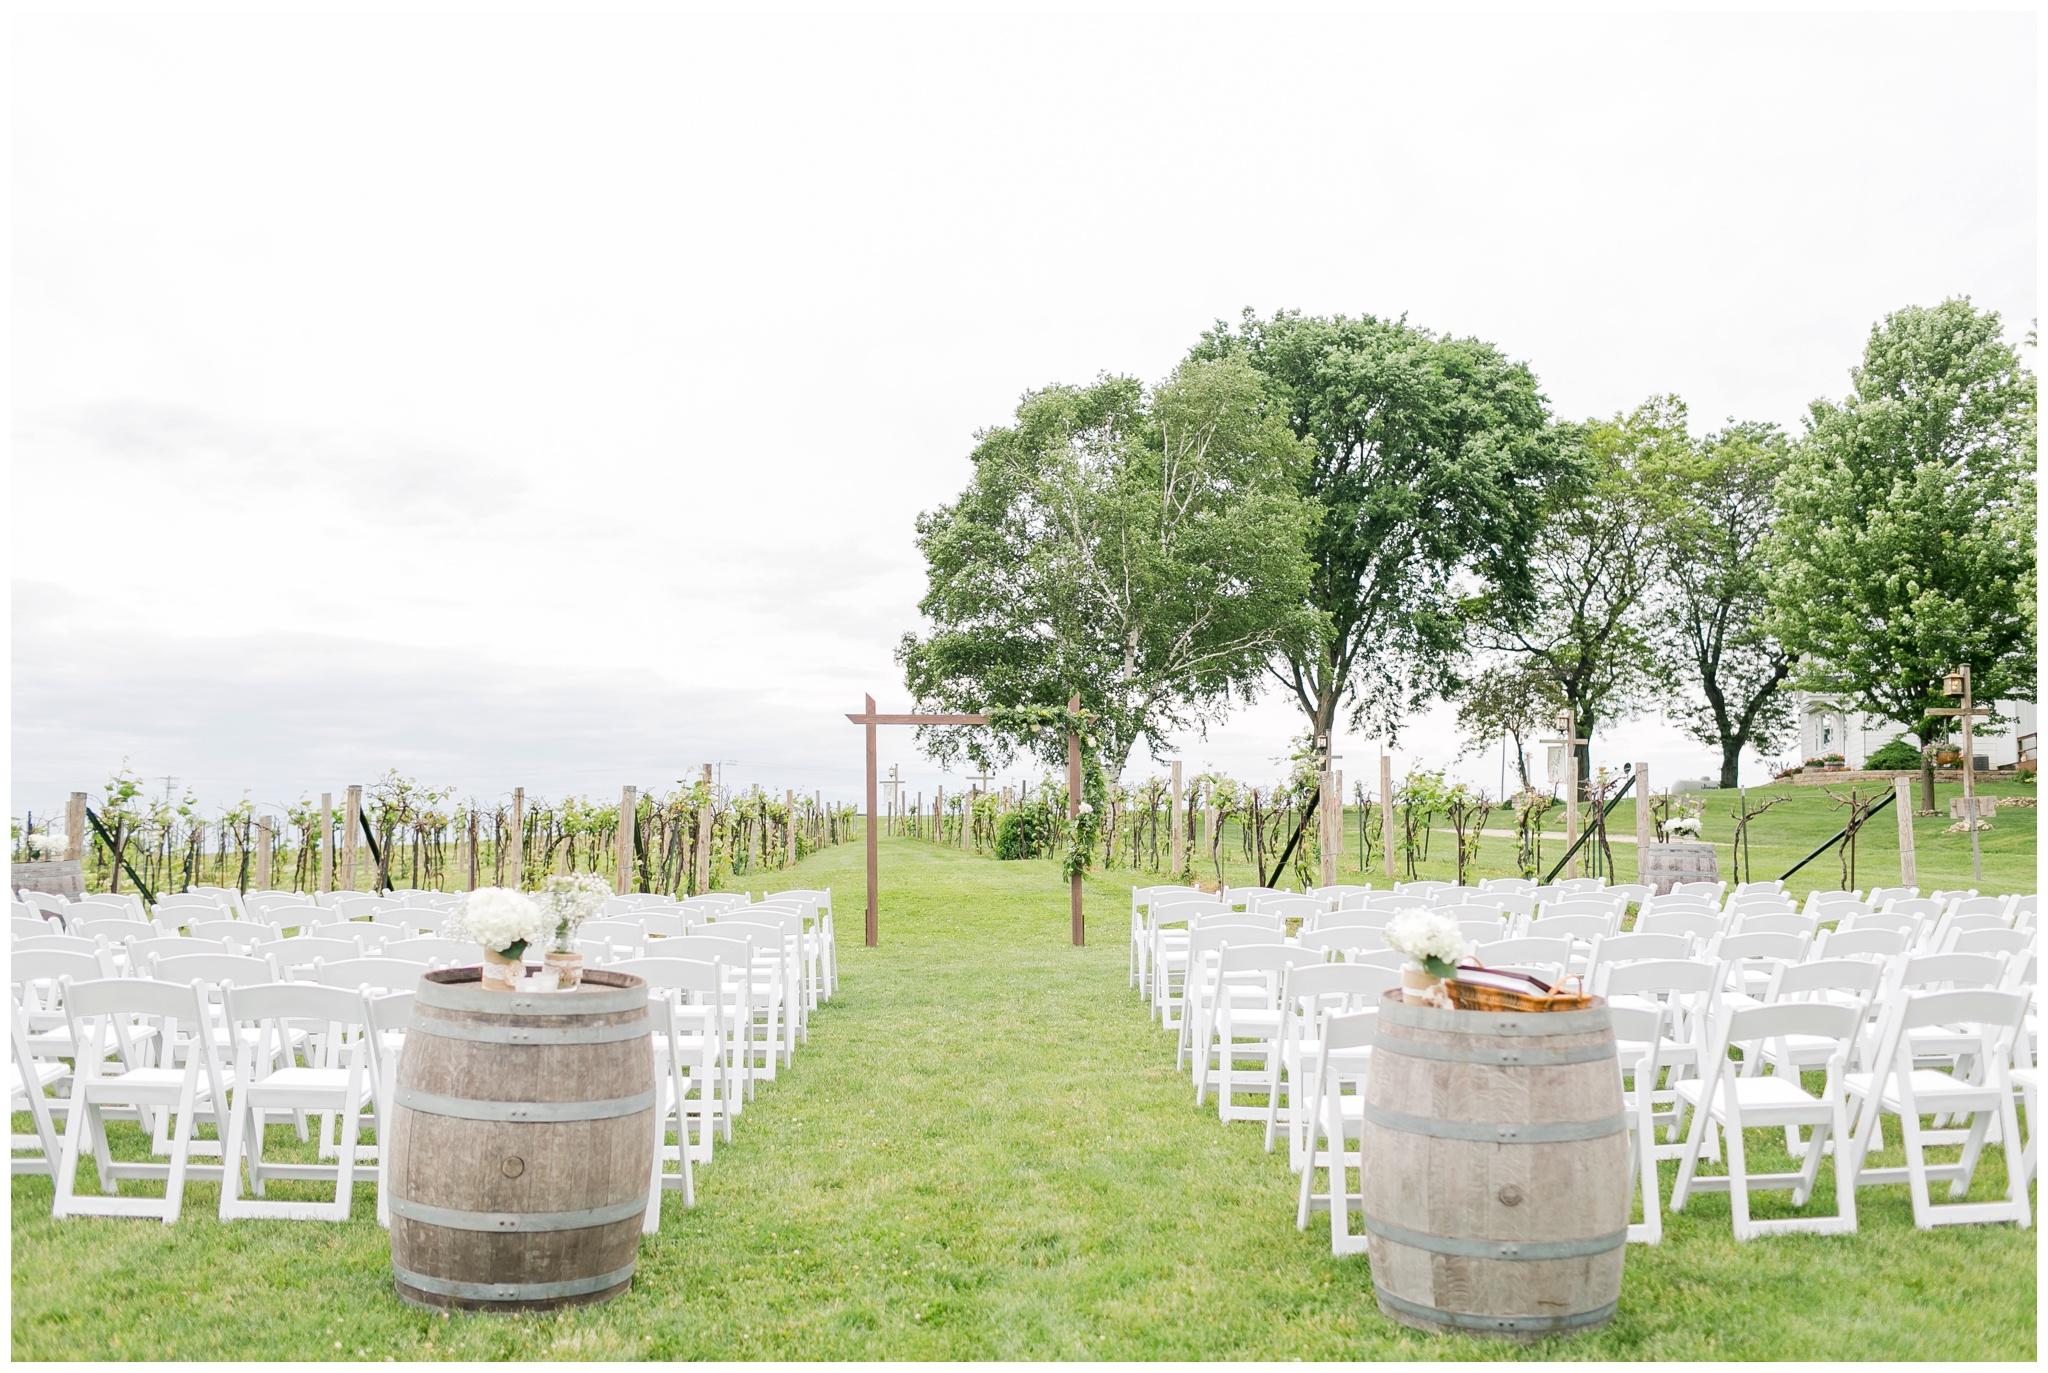 over_the_vines_wedding_edgerton_wisconsin_wedding_caynay_photo_4018.jpg